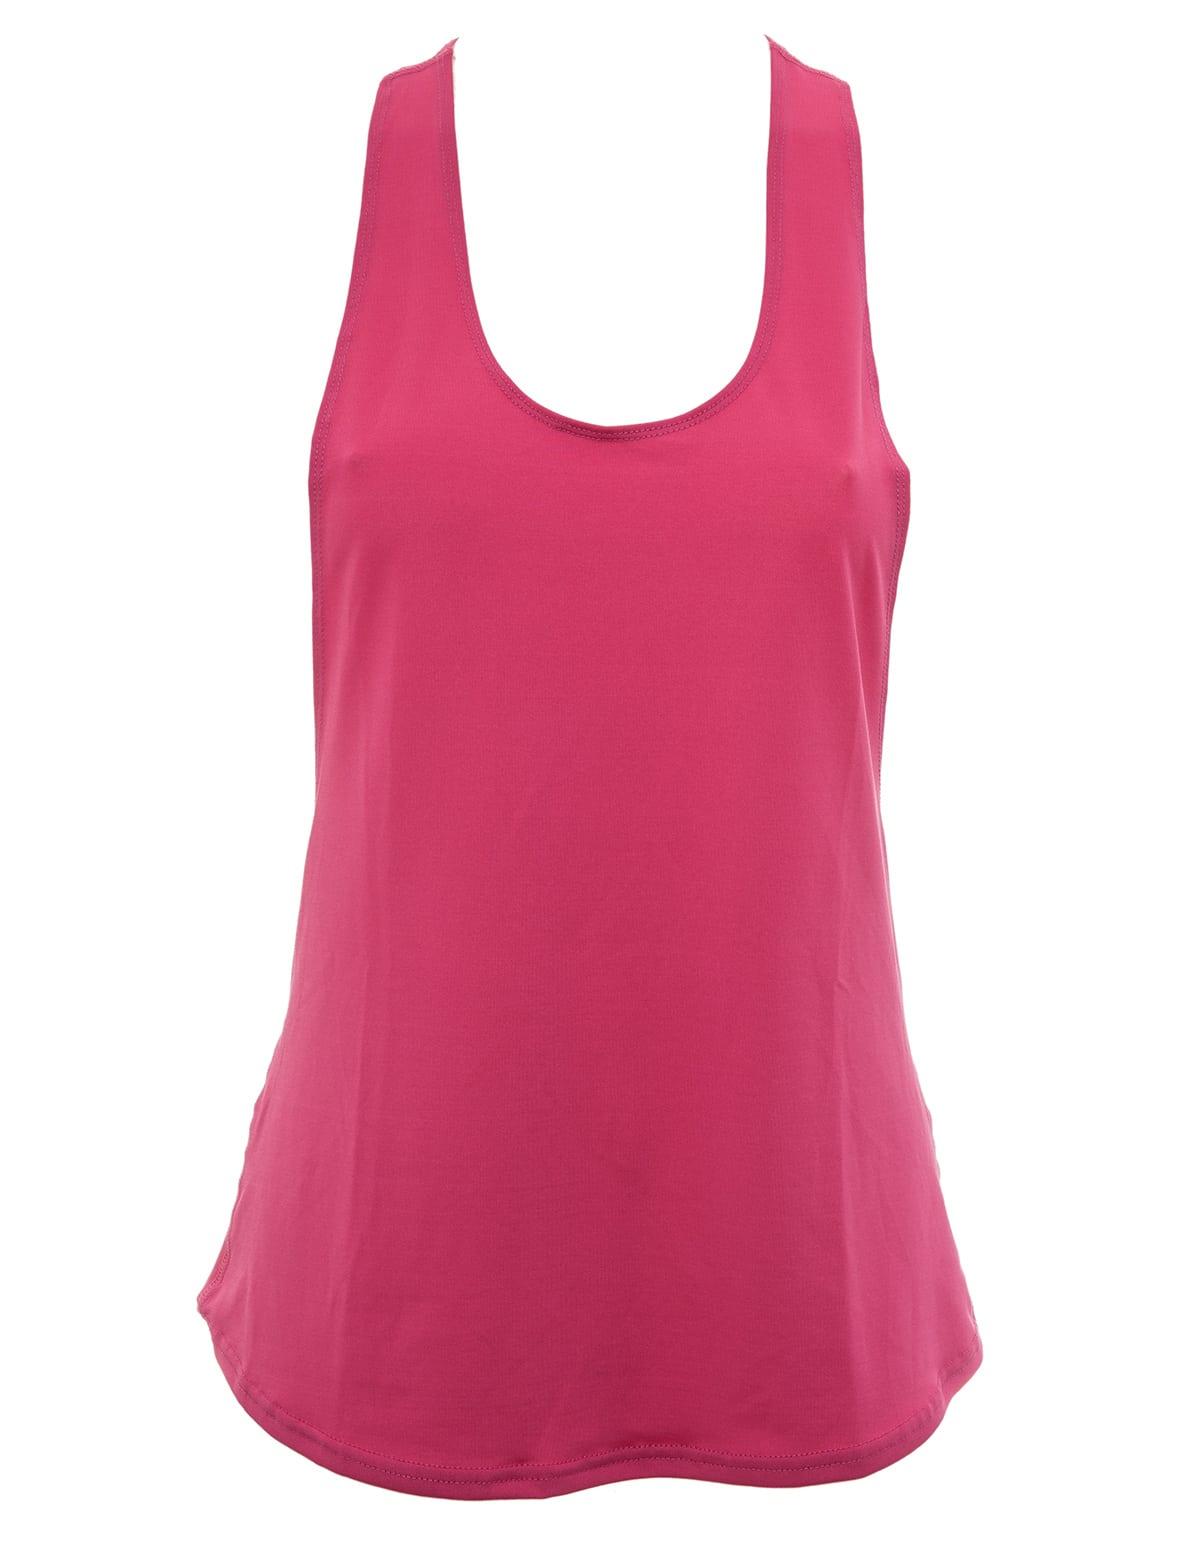 ed49182df81 Γυναικείο αθλητικό αμάνικο μπλουζάκι σε φούξια χρώμα